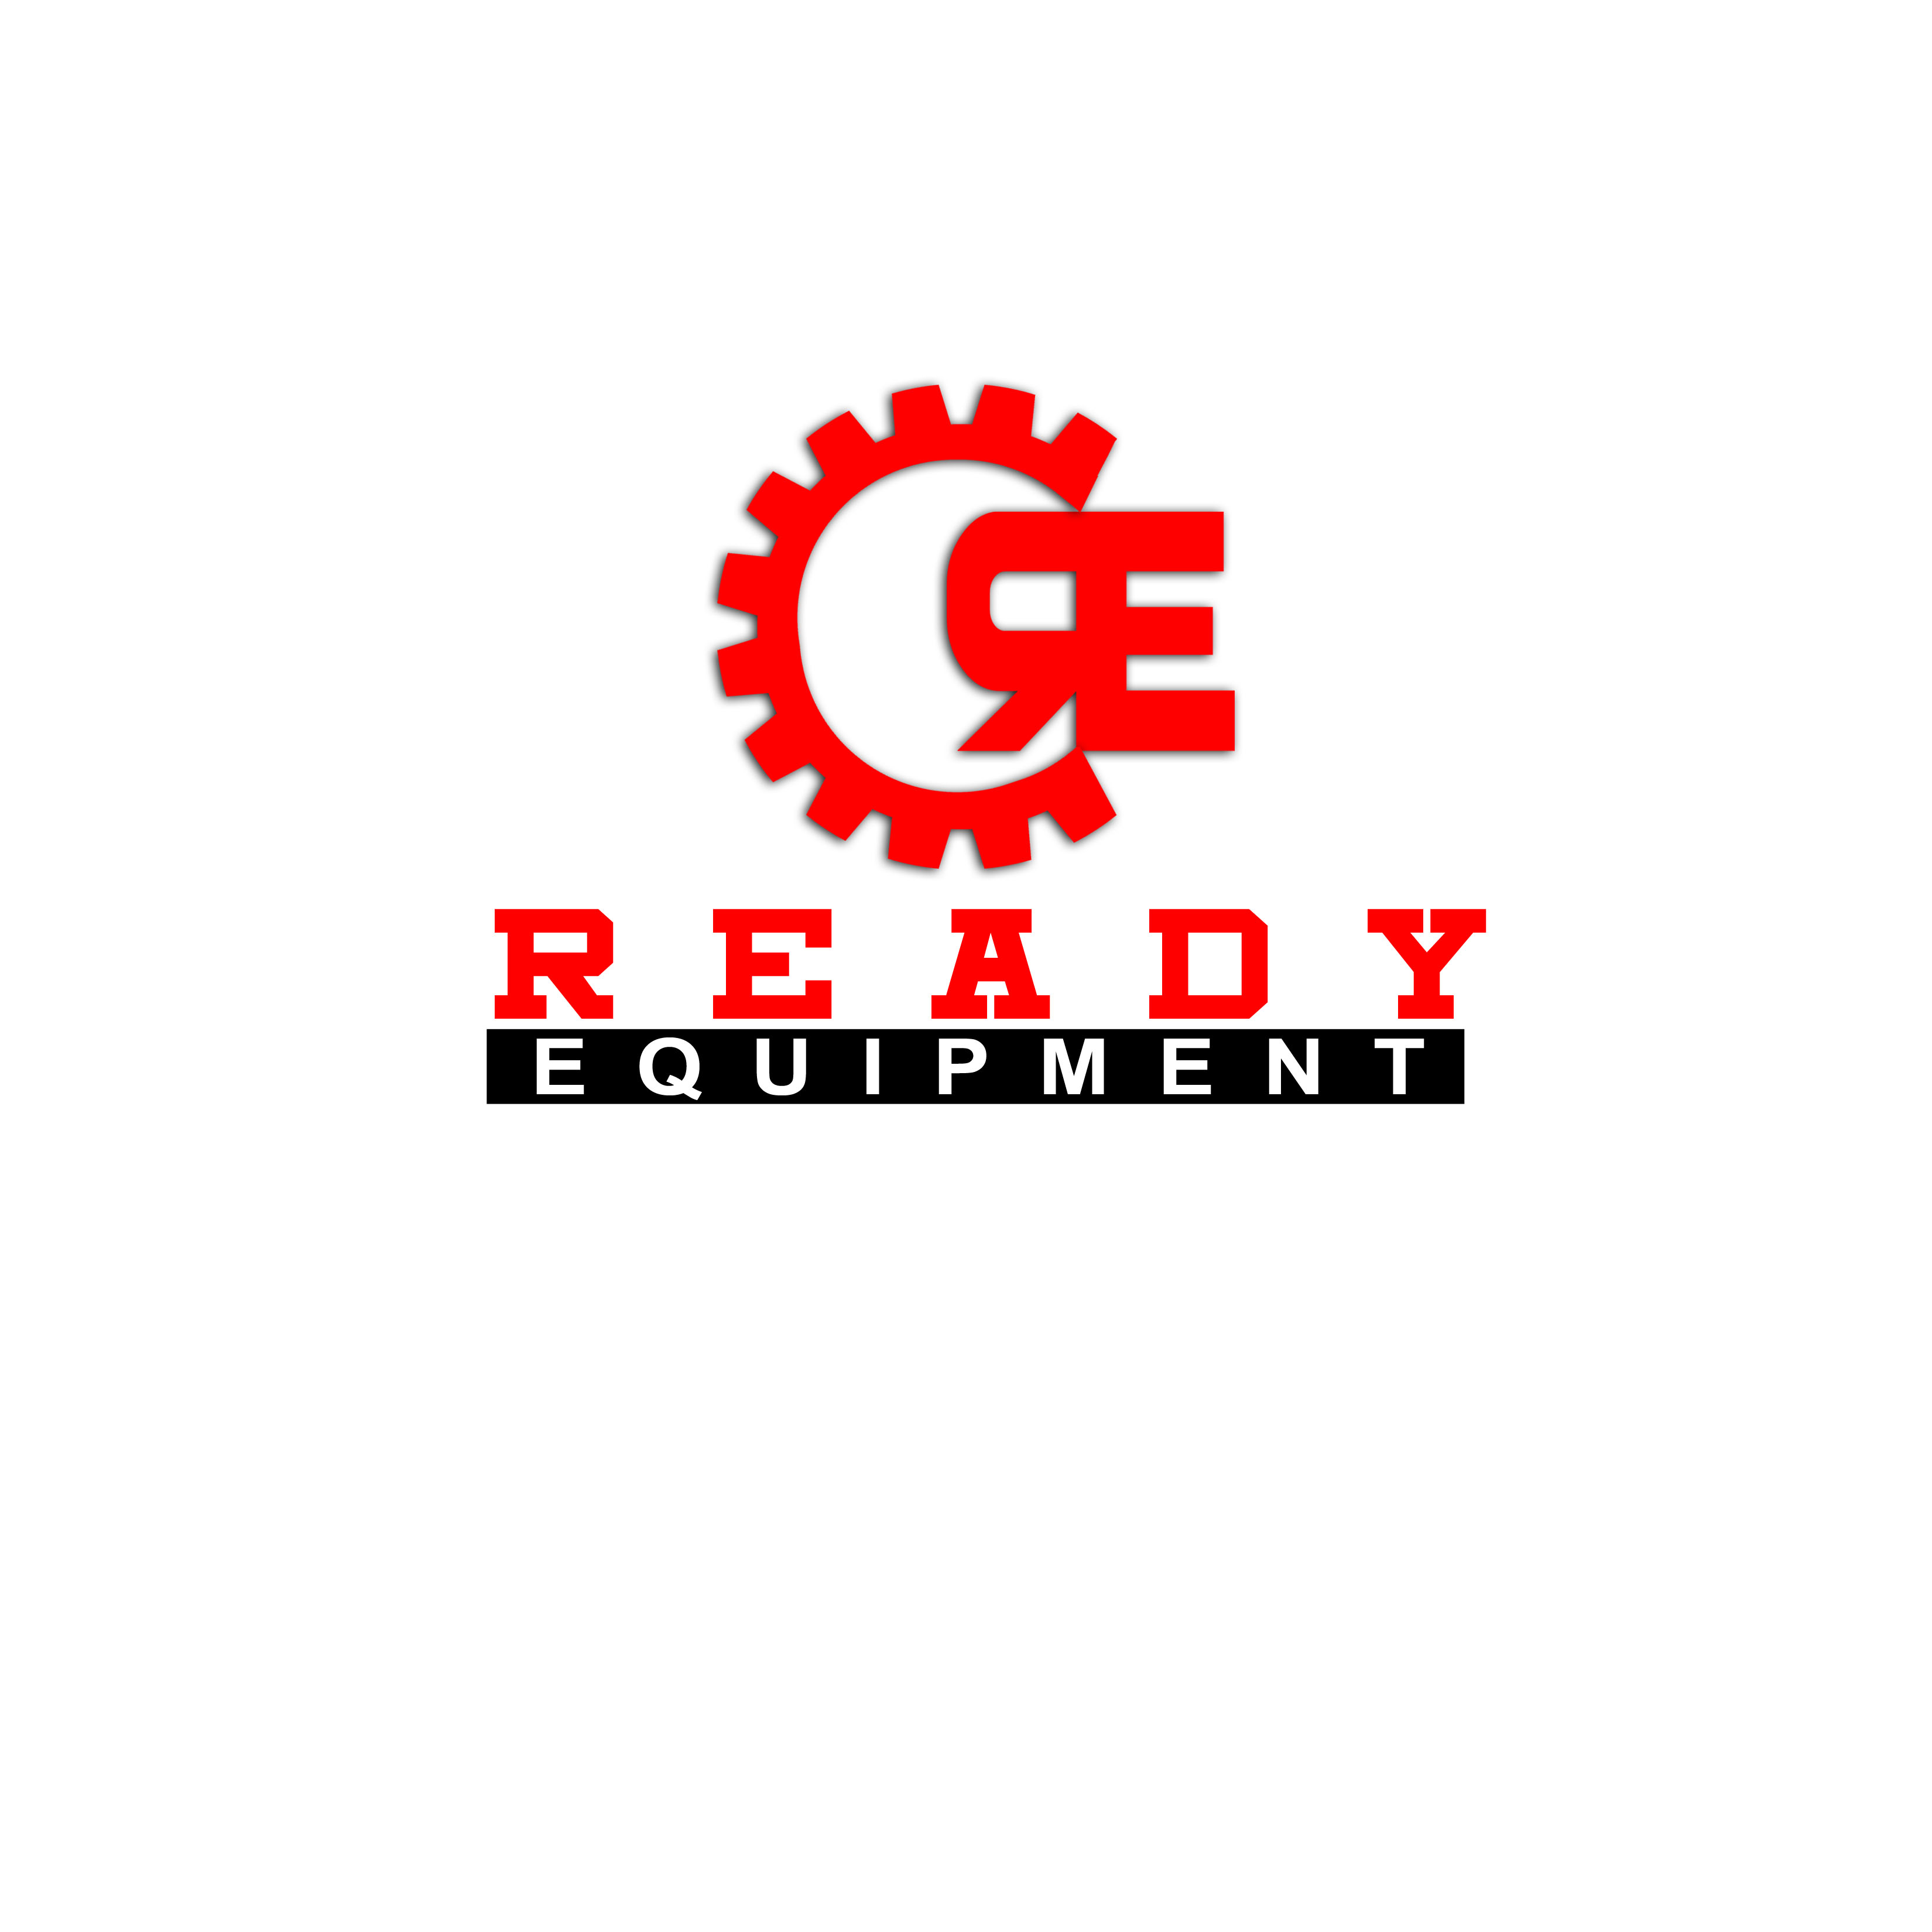 Logo Design by Allan Esclamado - Entry No. 140 in the Logo Design Contest Ready Equipment  Logo Design.